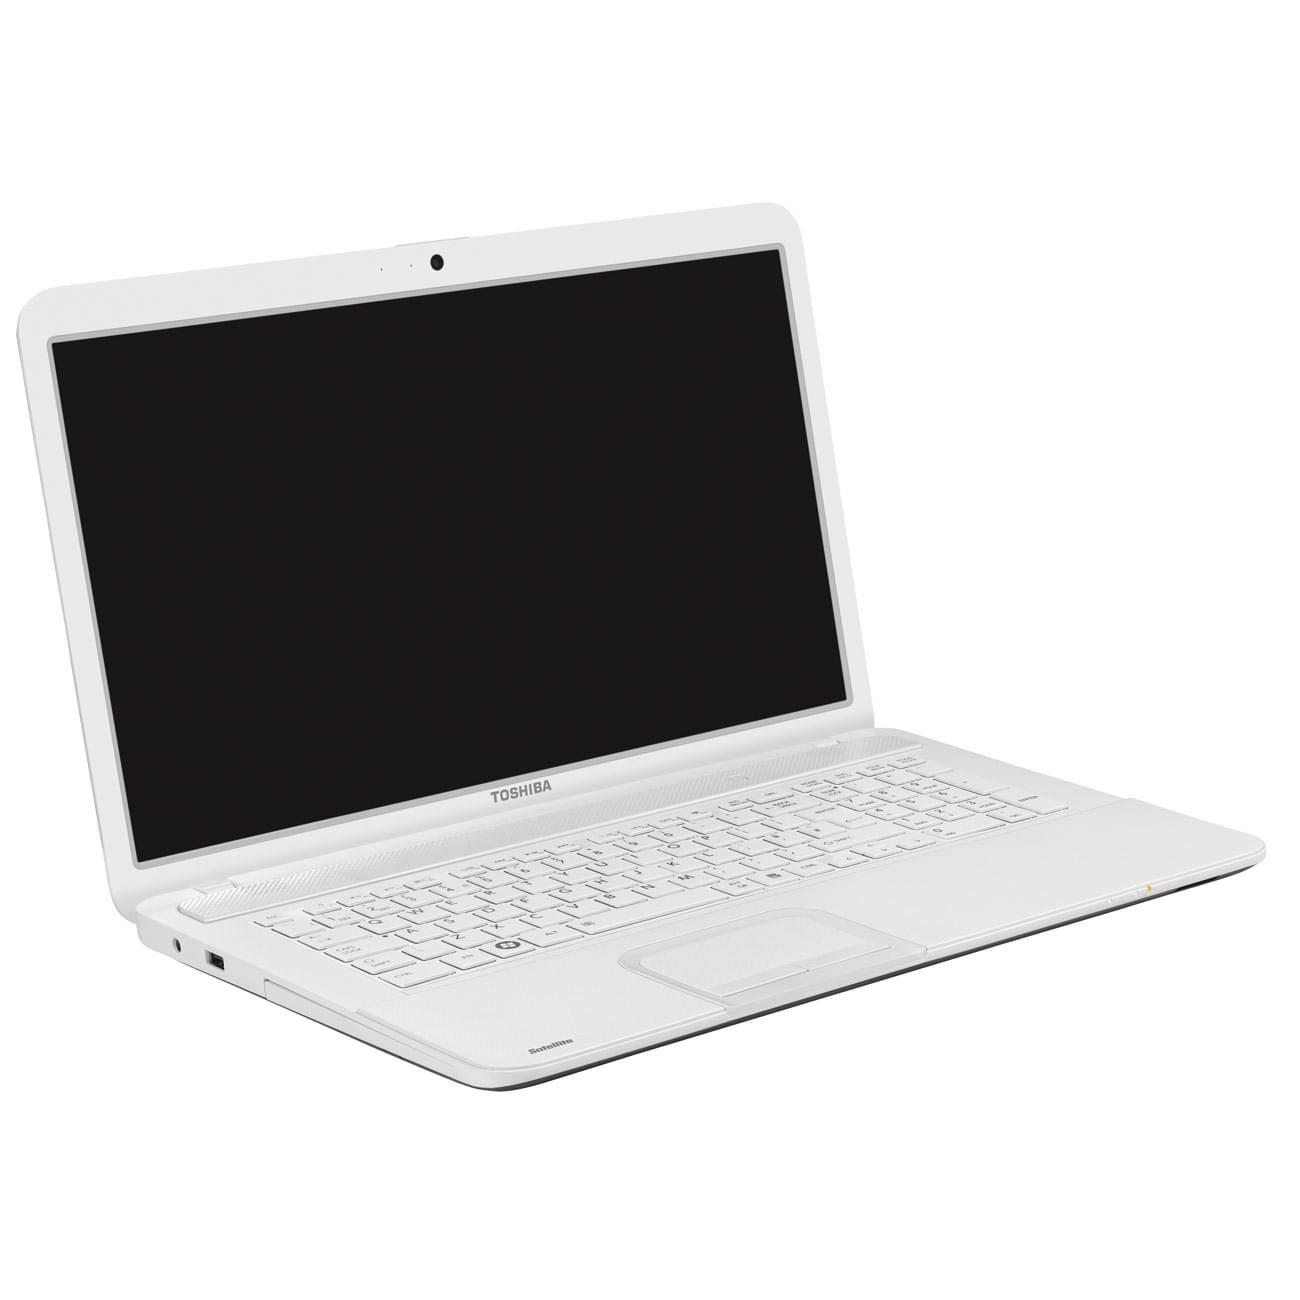 Toshiba PSCBCE-03F002FR - PC portable Toshiba - Cybertek.fr - 0